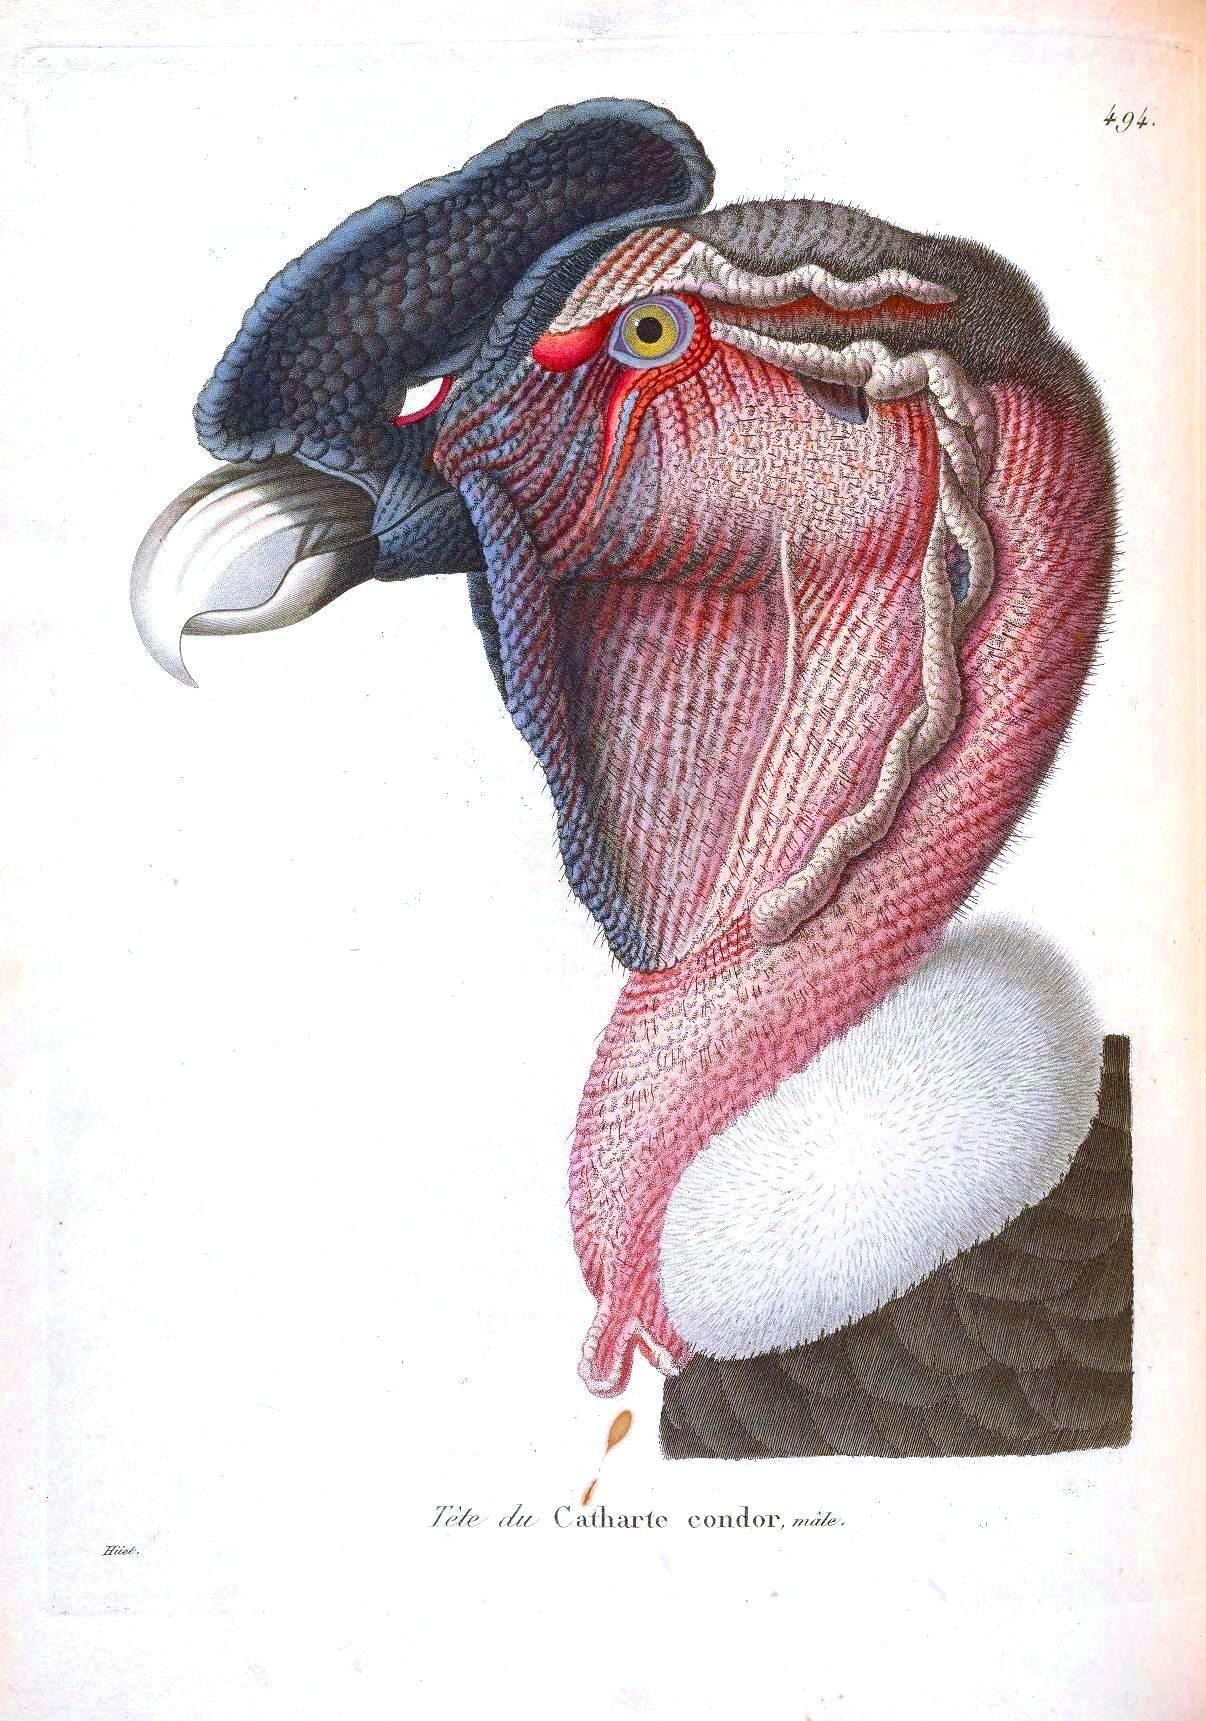 Animal Animal Head Bird Tete De Condor Looks Sort Of Like A